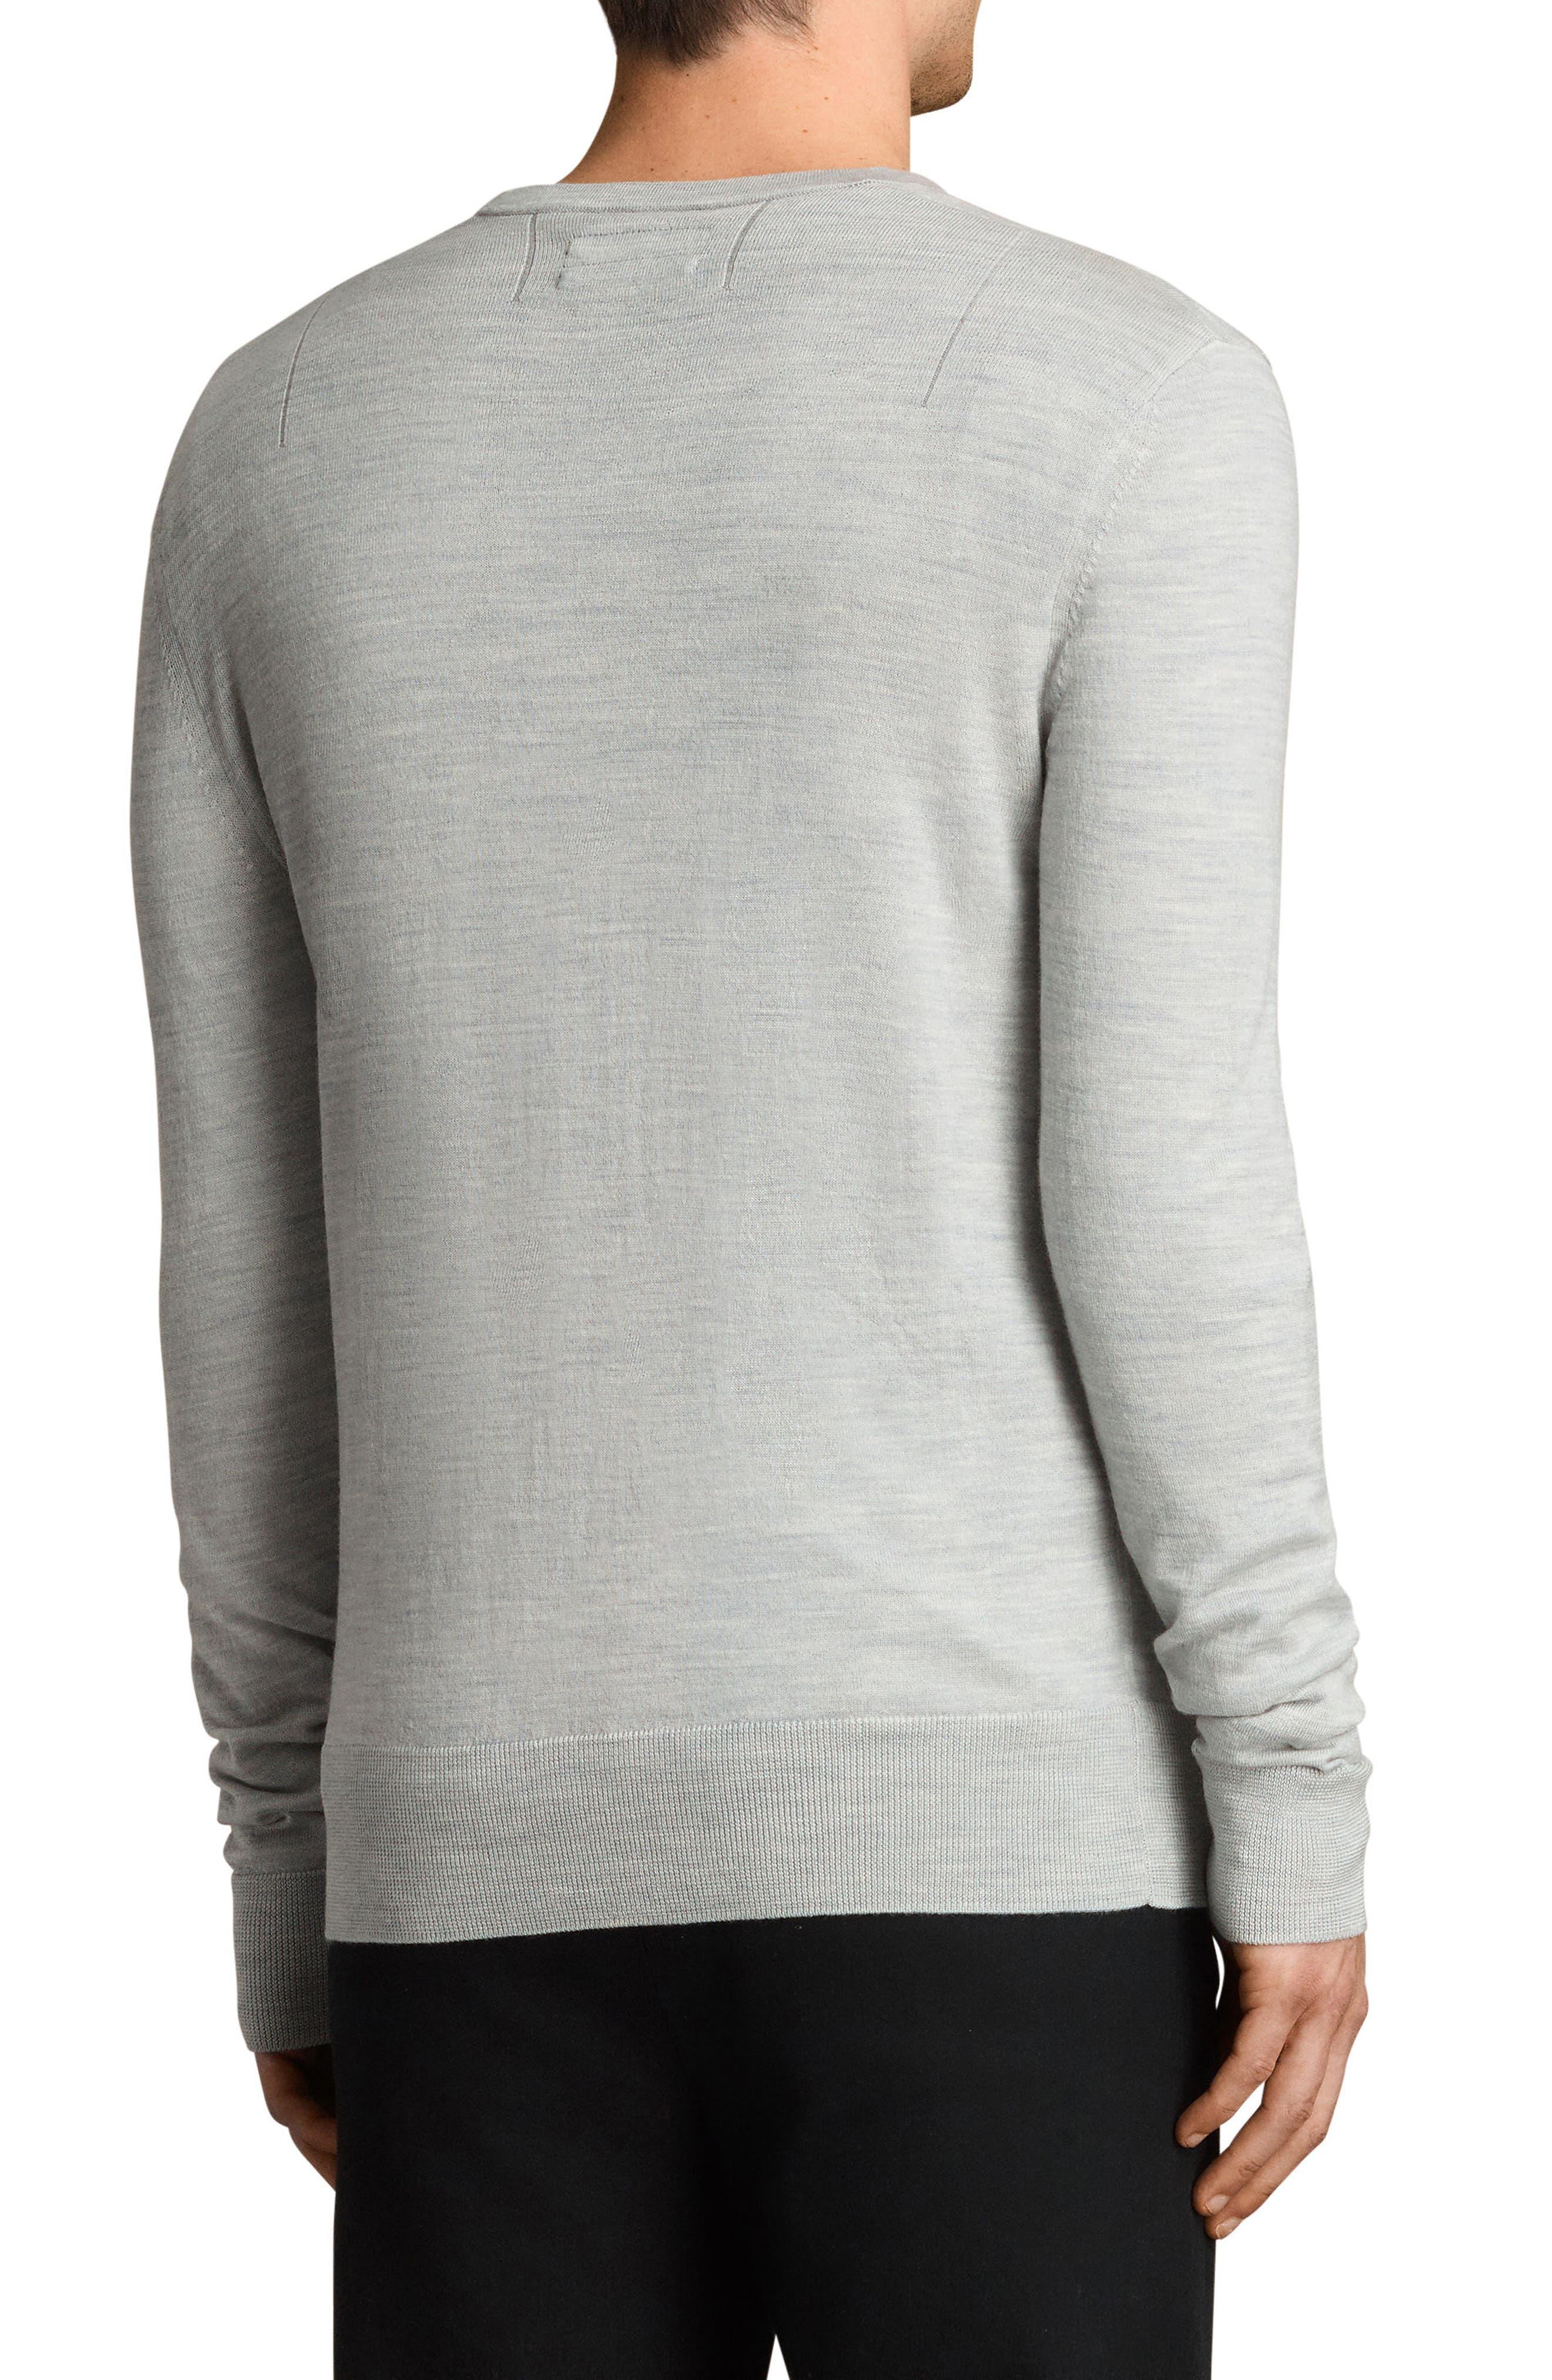 Mode Slim Fit Merino Wool Sweater,                             Alternate thumbnail 2, color,                             Light Grey Marl